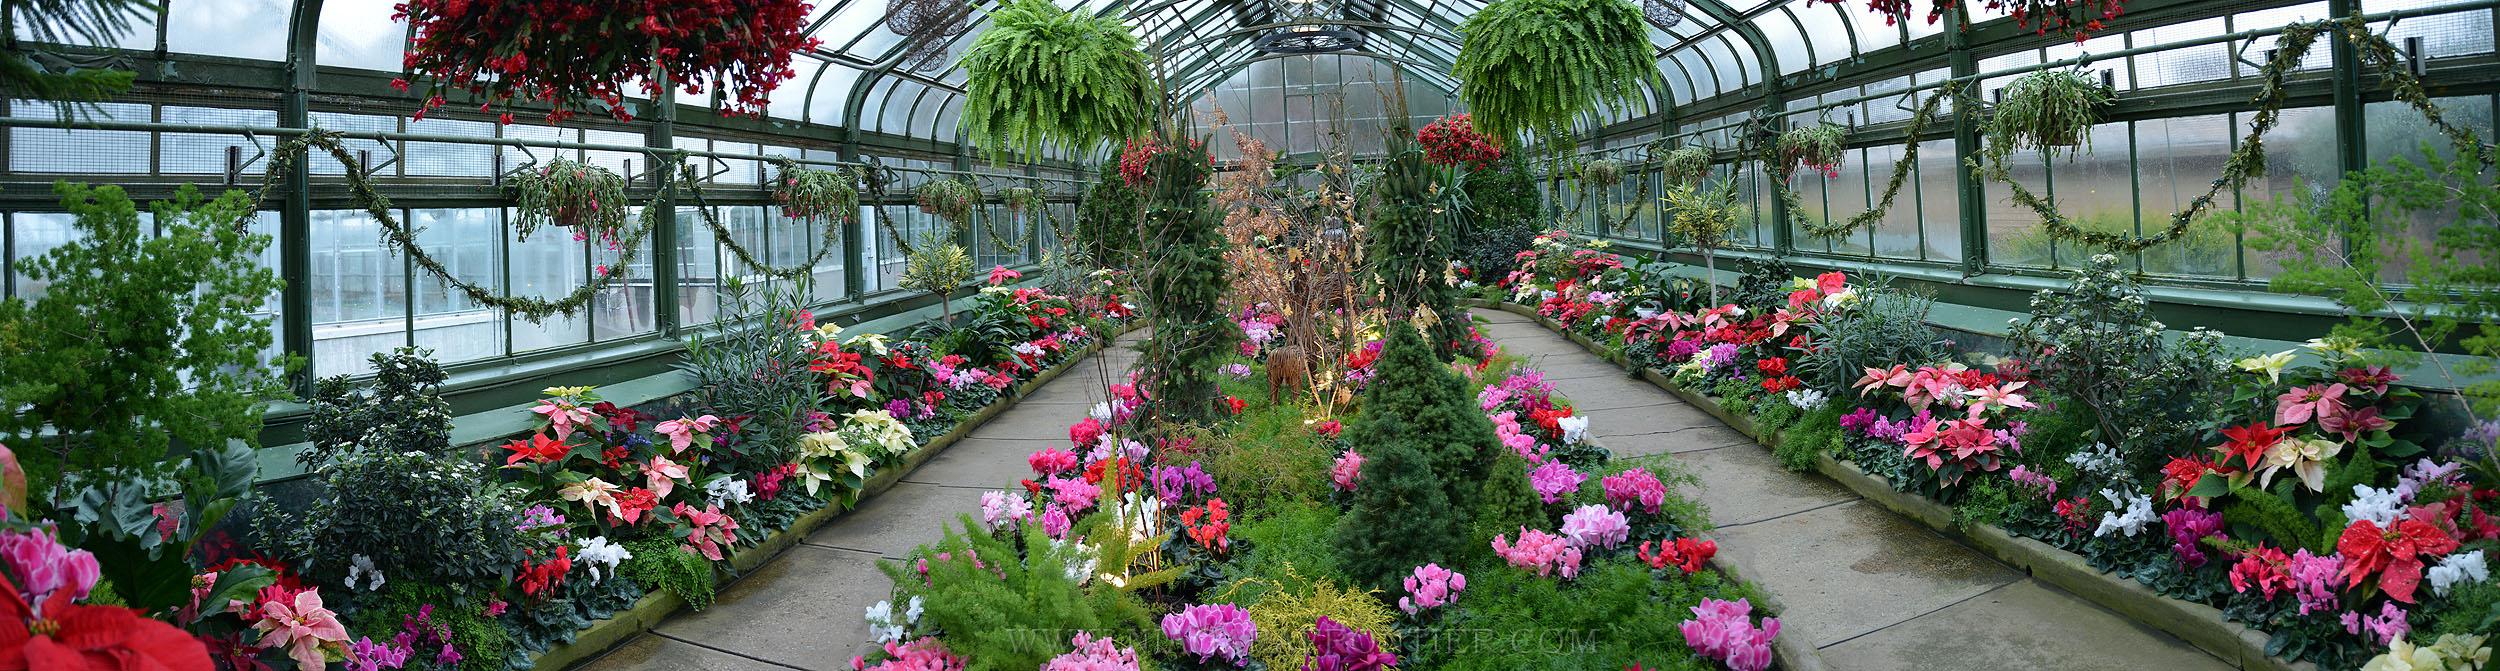 Niagara Falls Floral Showhouse Greenhouse